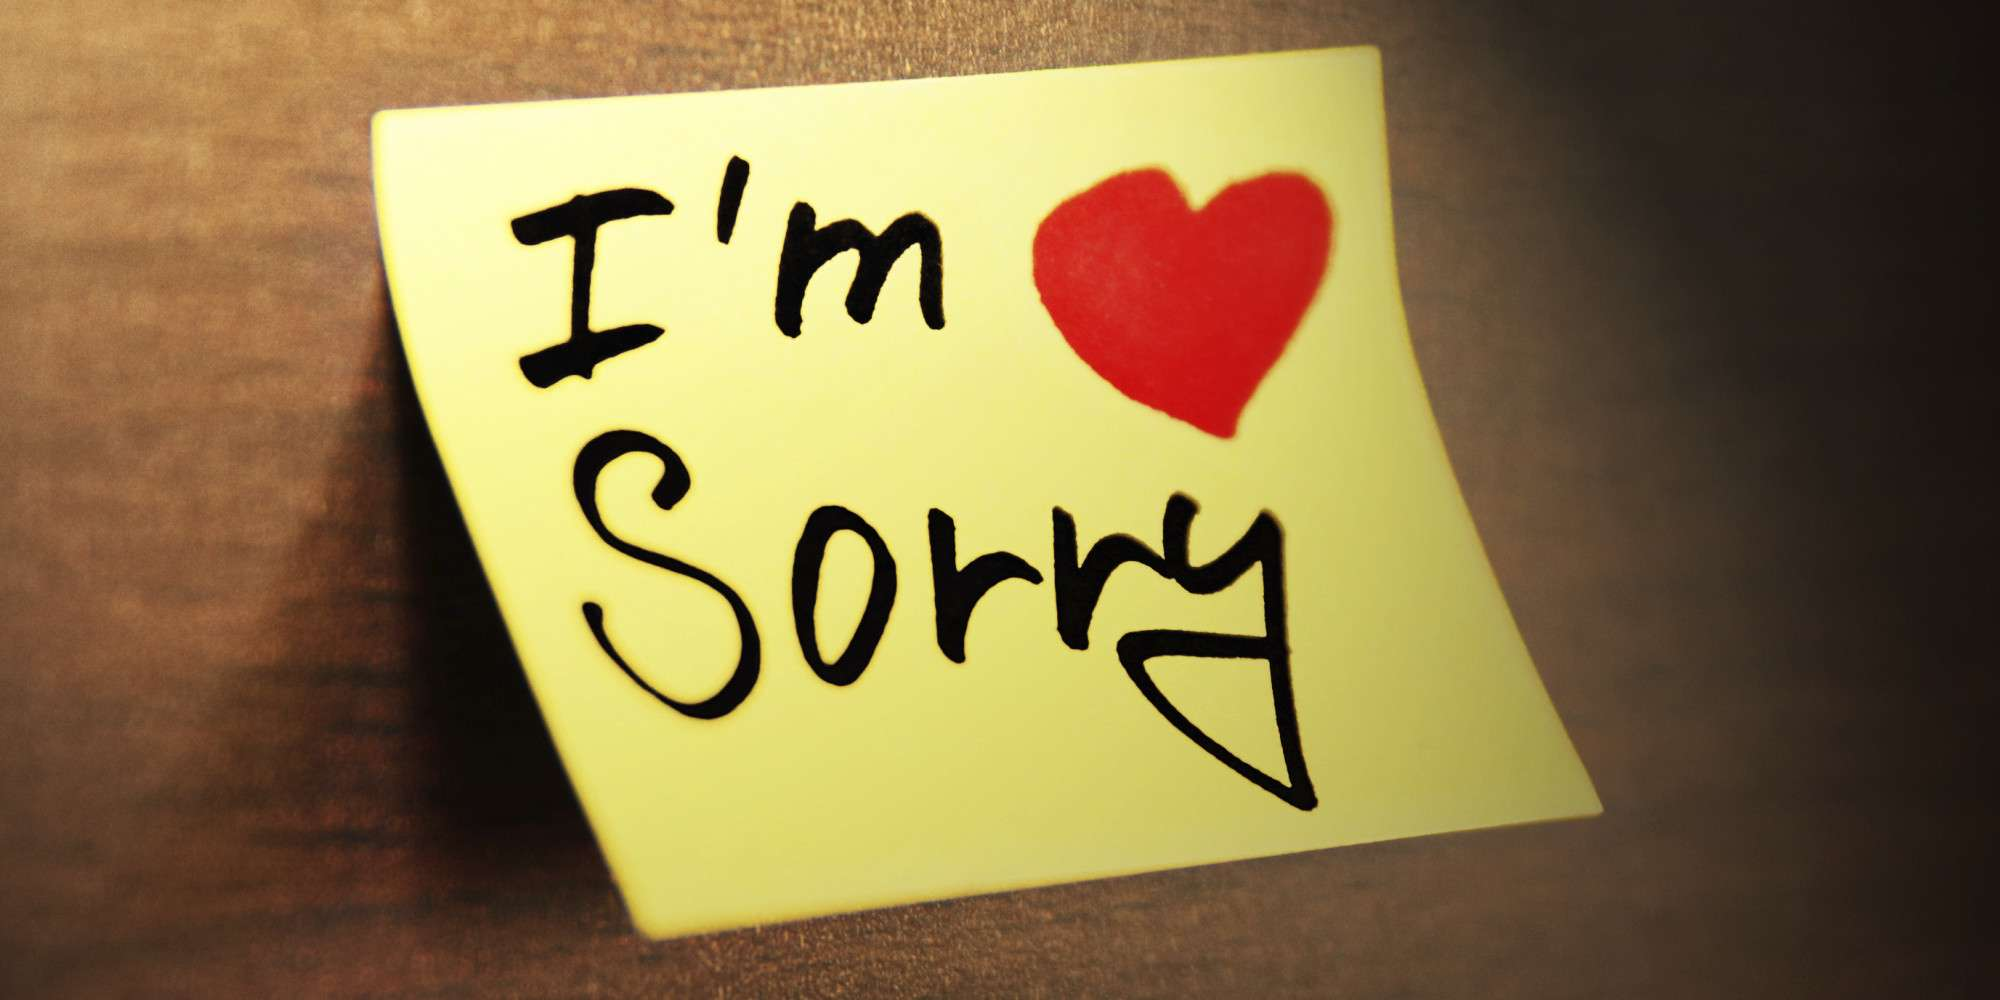 صور رسائل اعتذار للزوج , صور رسائل اسف واعتذار للزوج